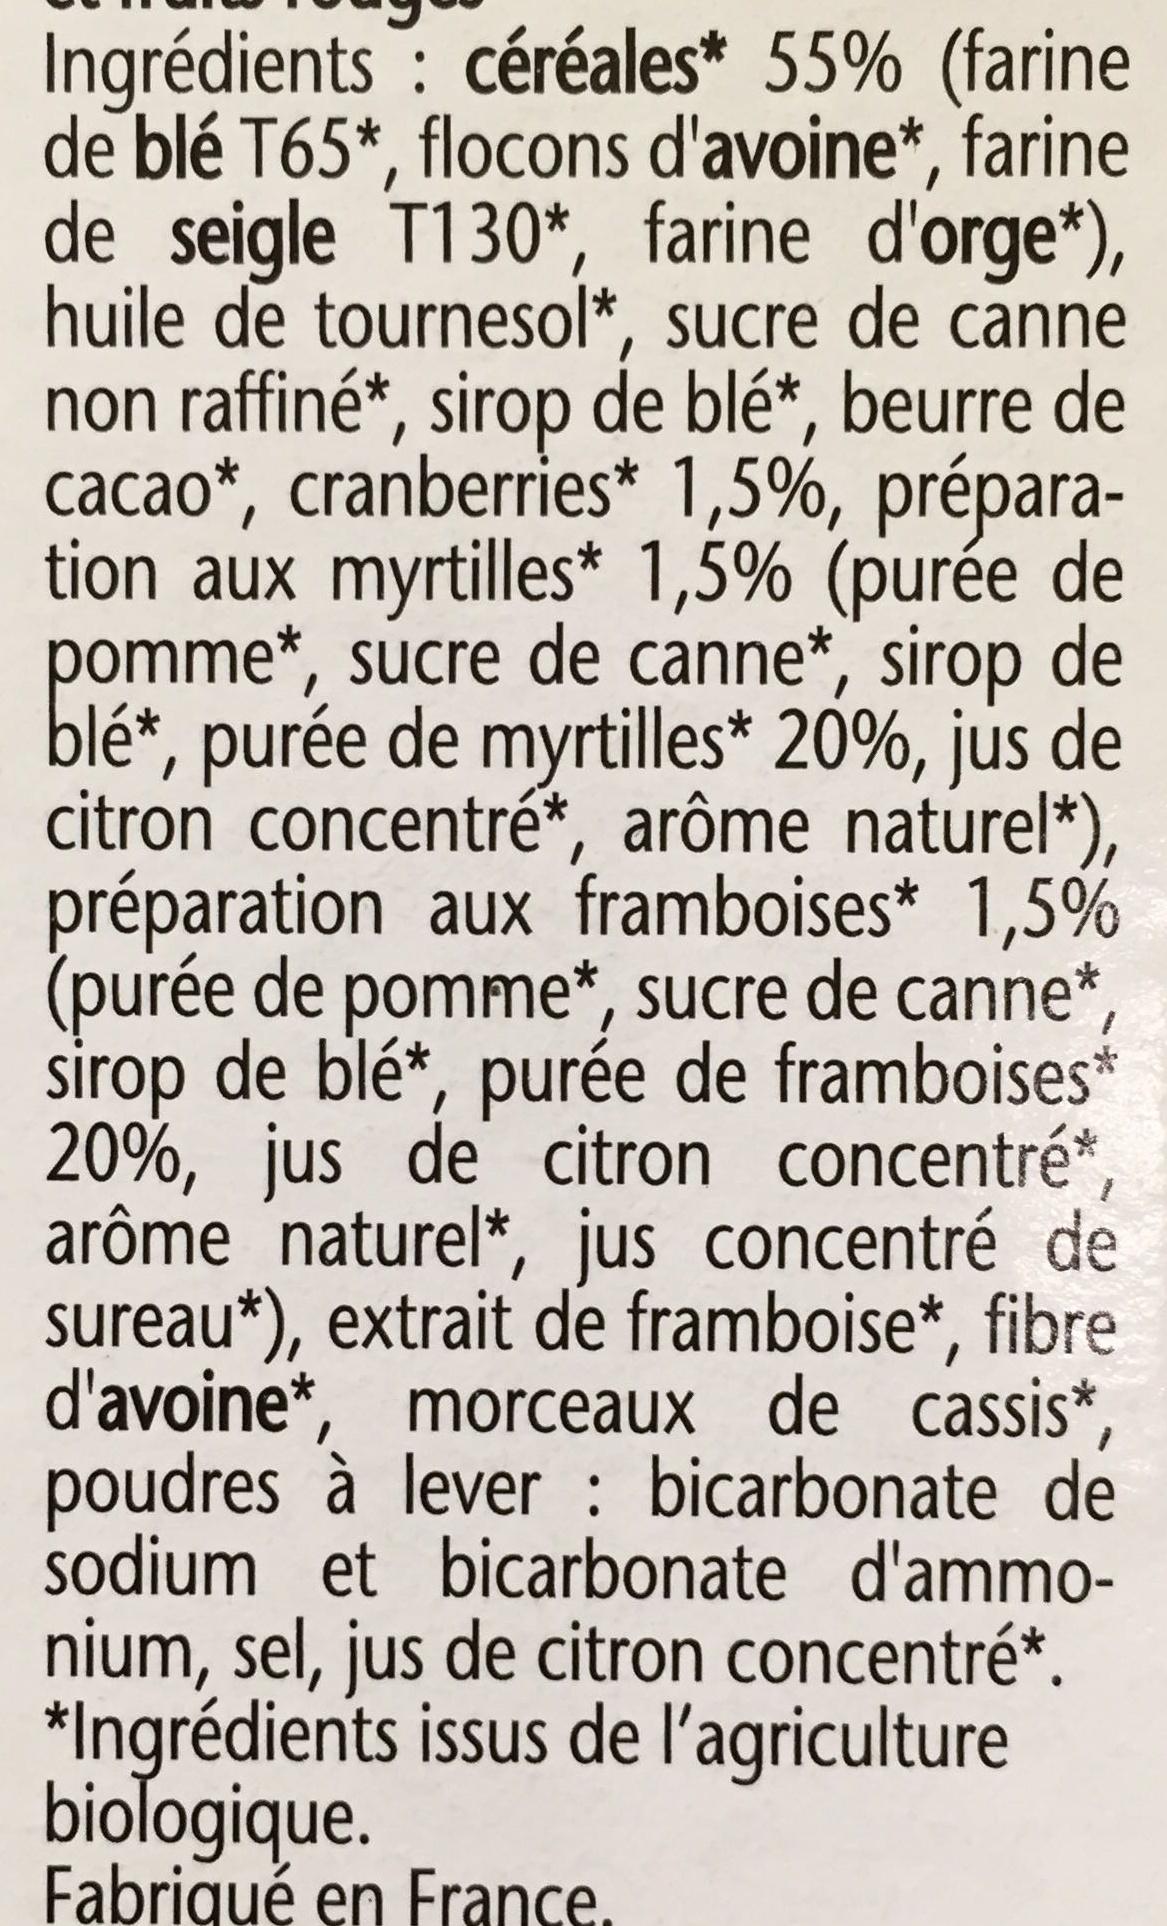 Biscuits p'tit dej bio - Ingrédients - fr